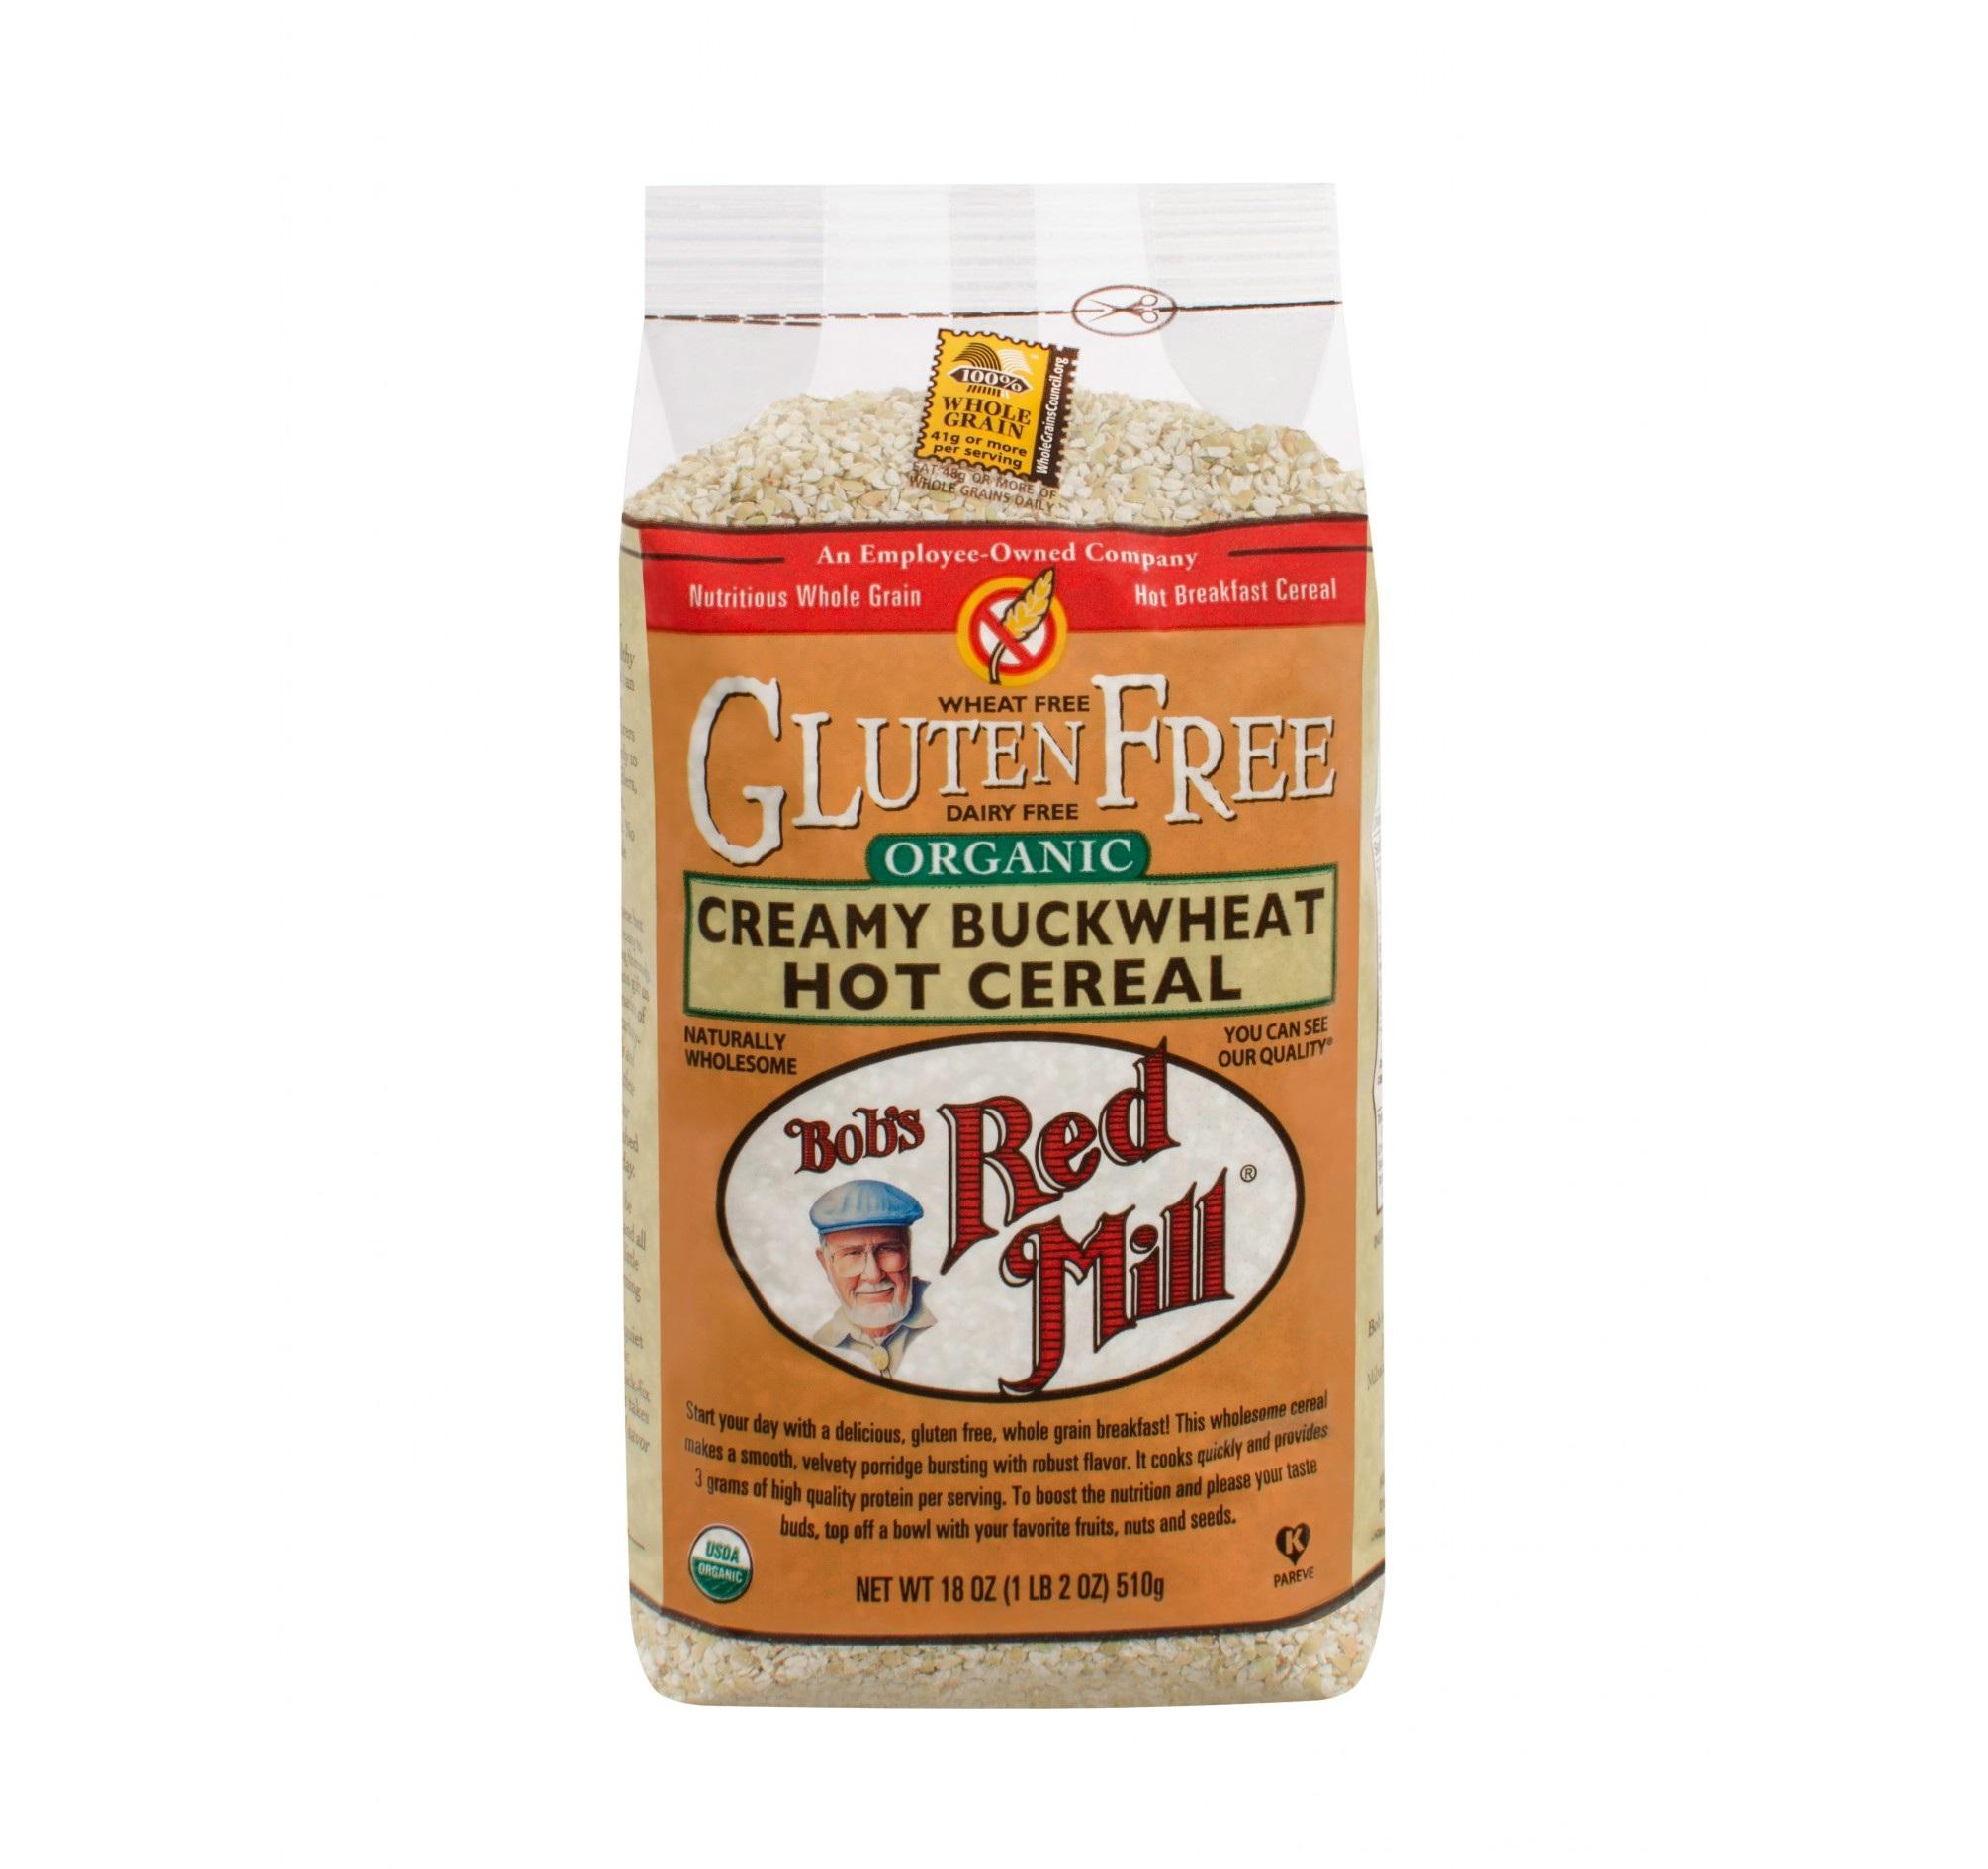 Bob's Red Mill Organic Creamy Buckwheat Hot Cereal